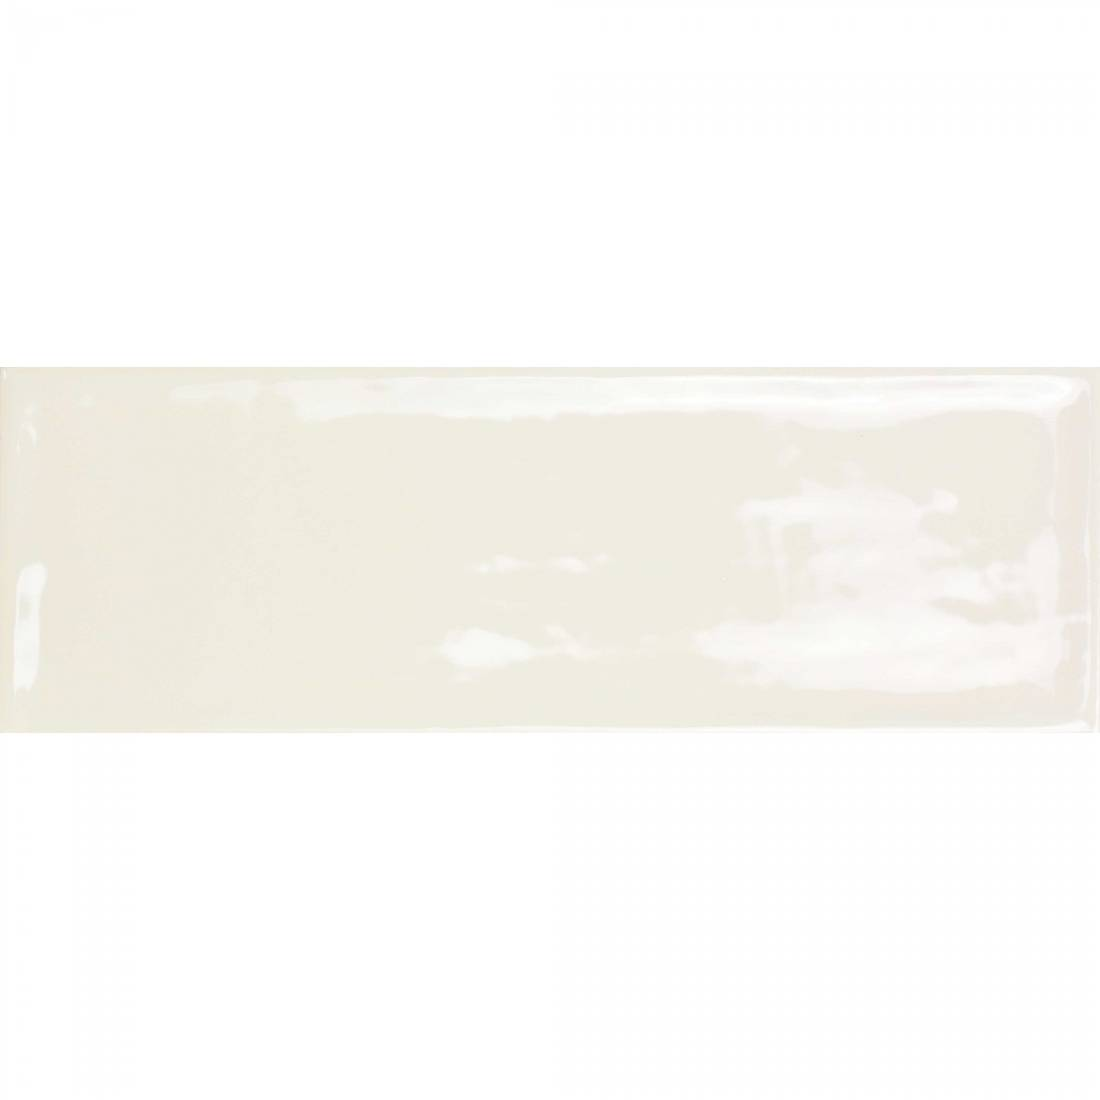 Esencia 10x30 Cream Gloss 1